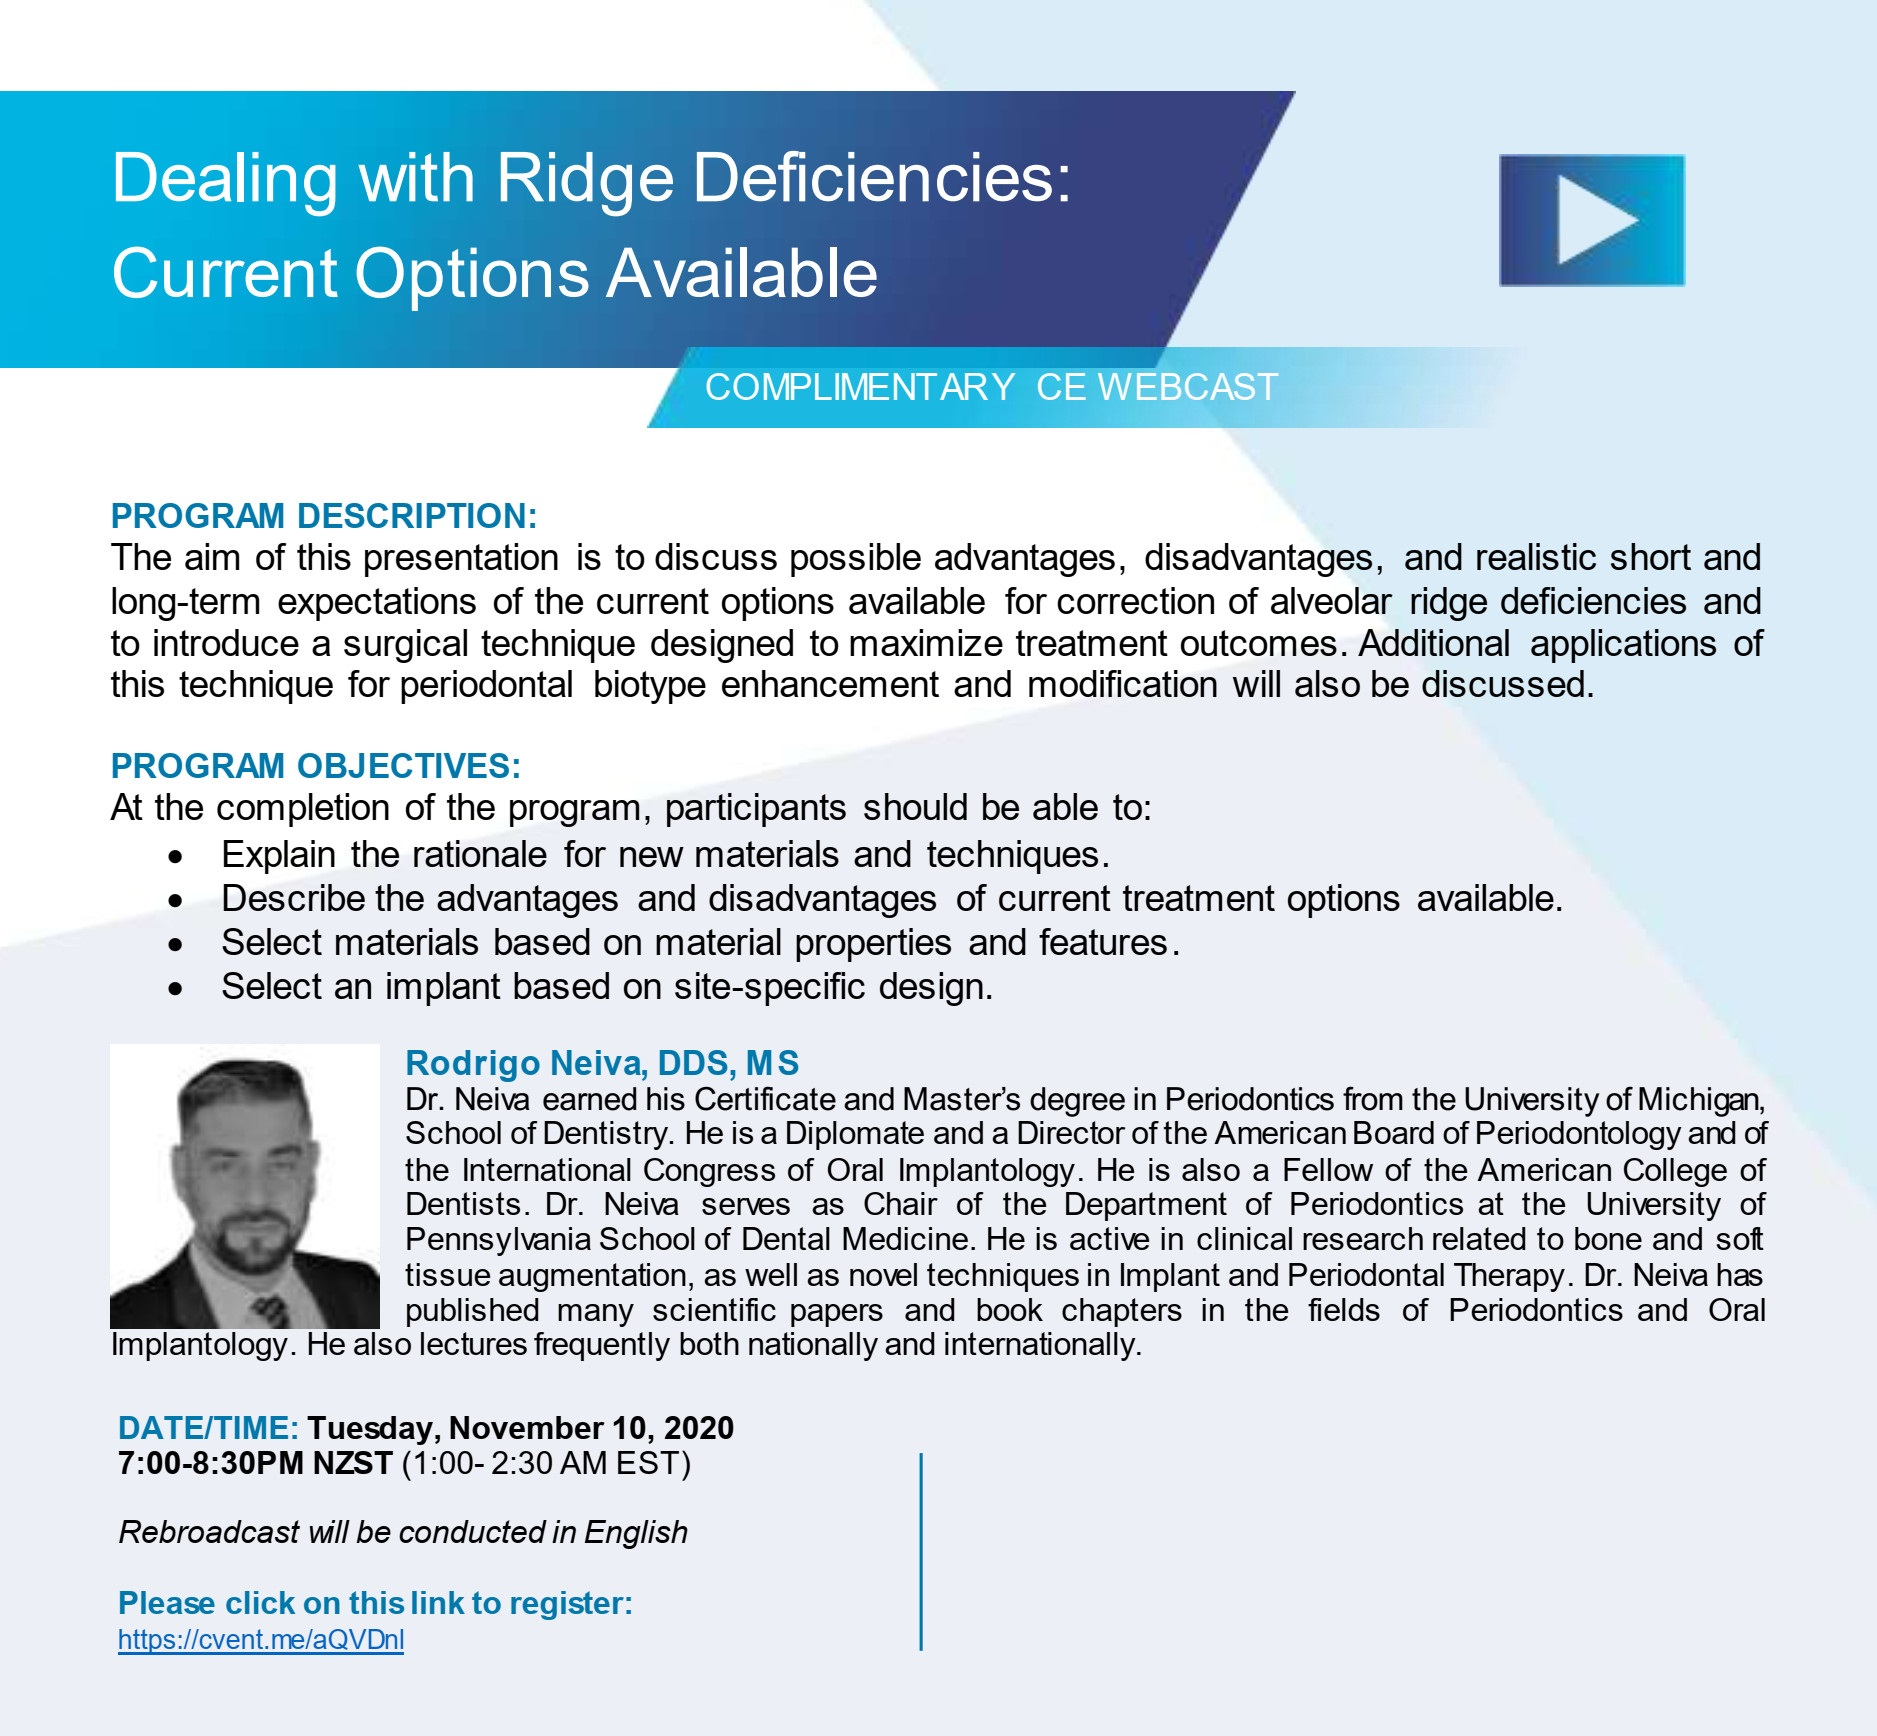 Dealing-wthi-ridge-deficiencies-02-cut